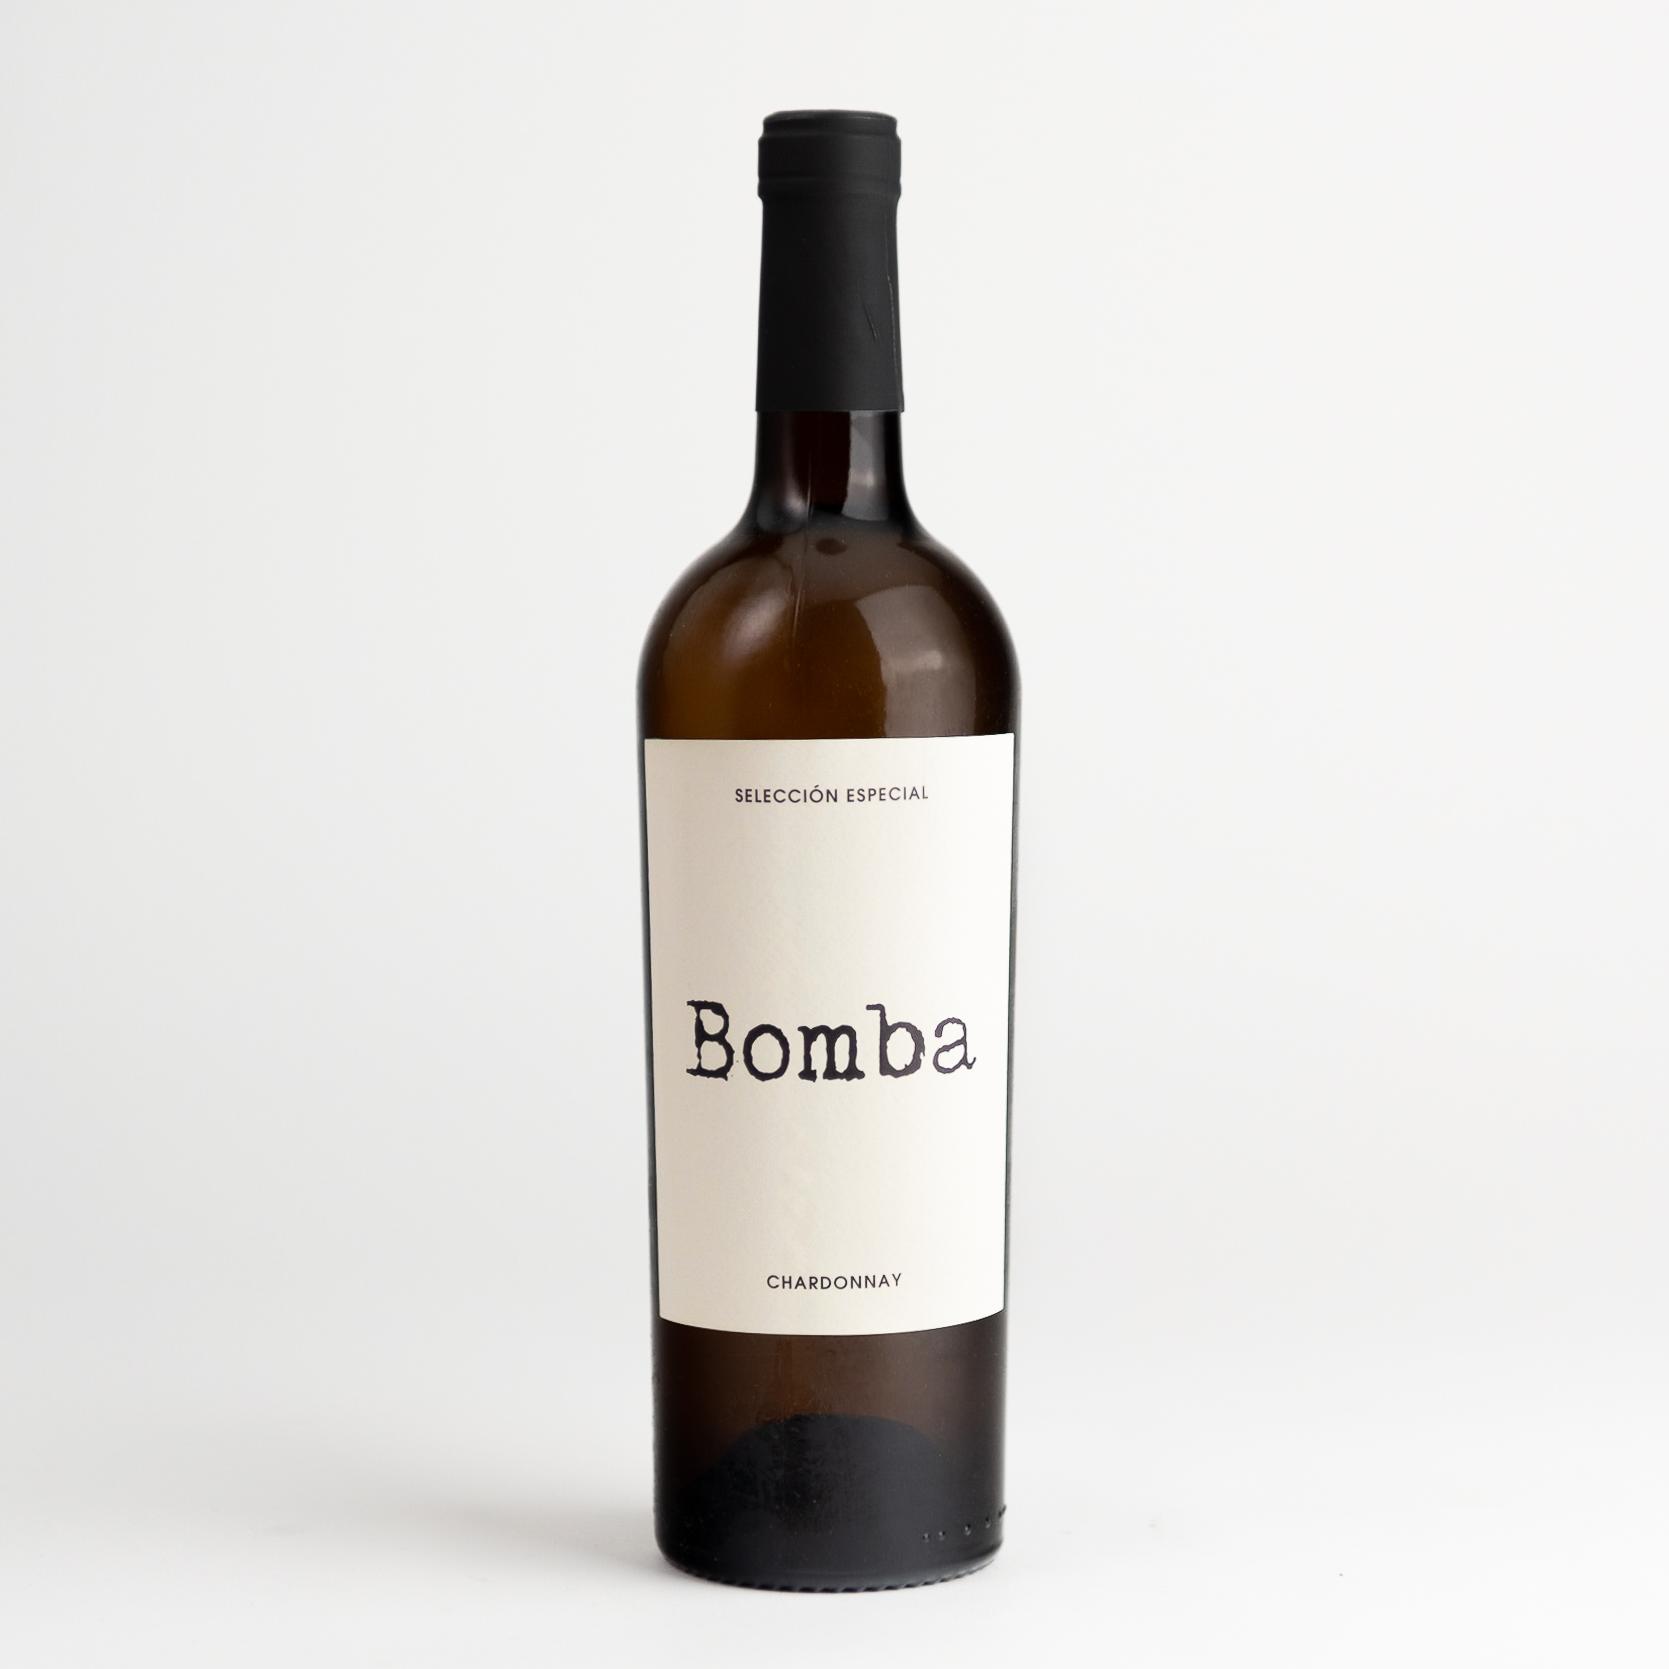 Bomba Chardonnay